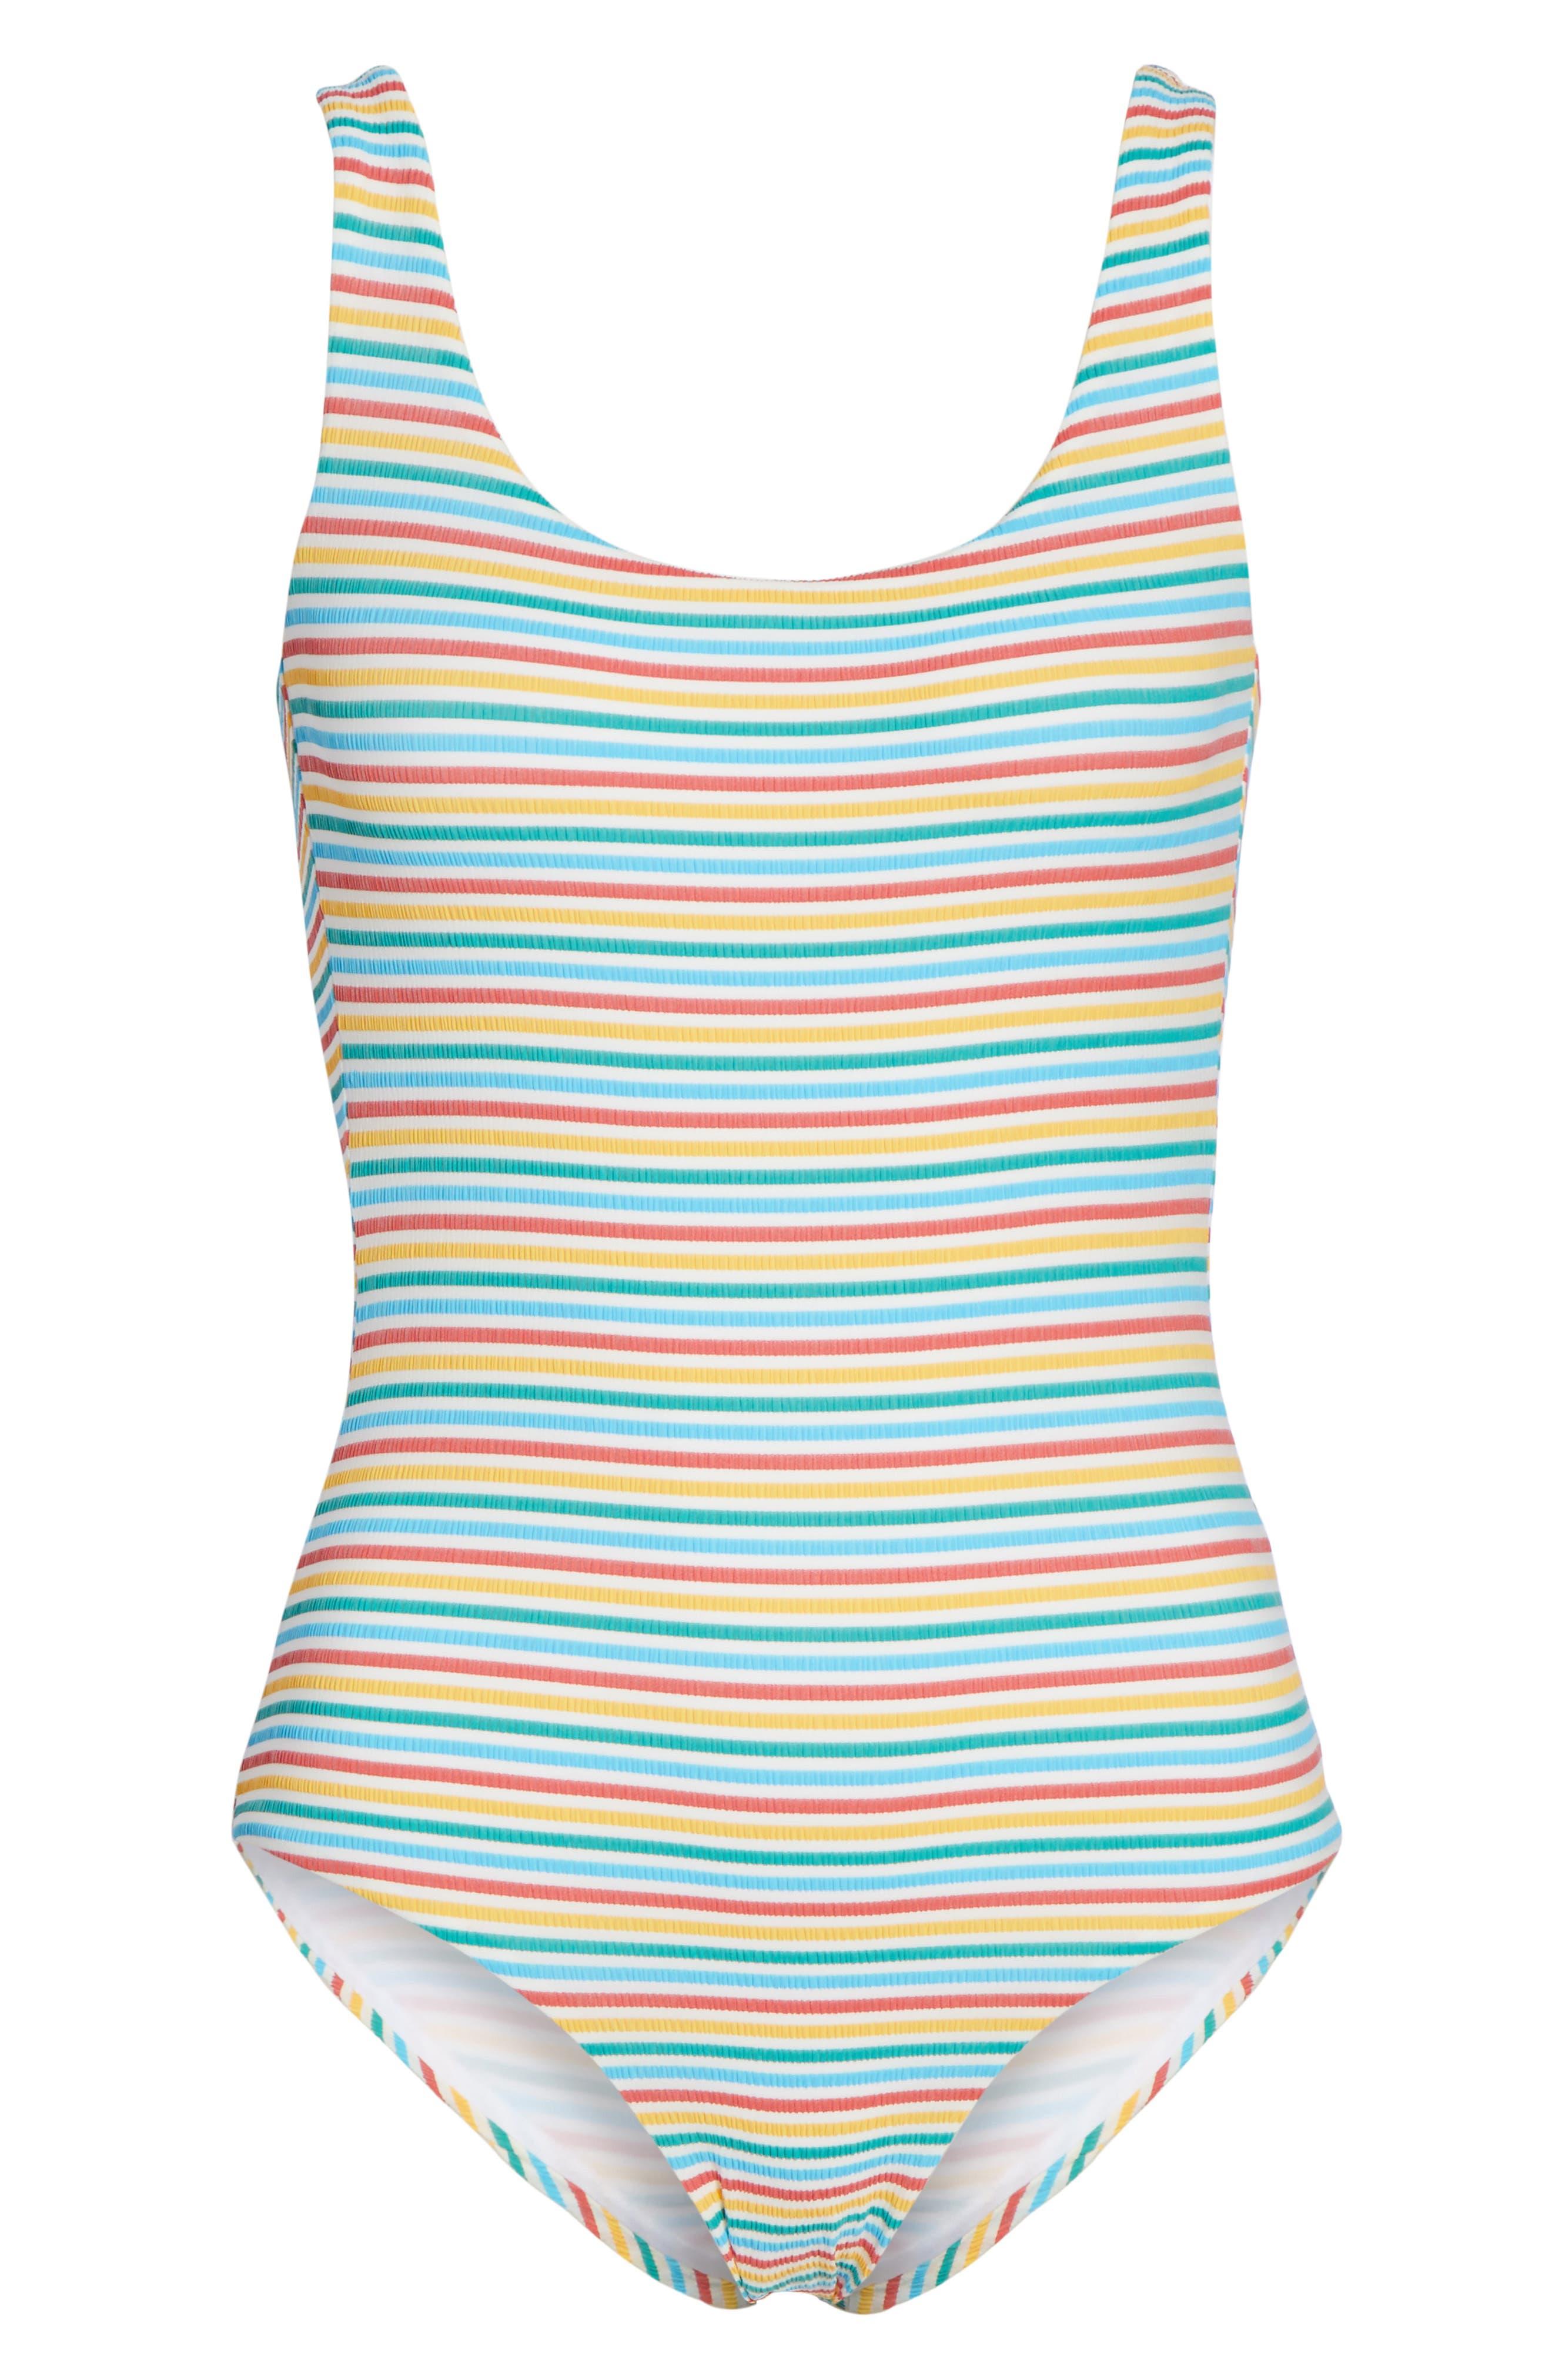 Stripe Low Back One-Piece Swimsuit,                             Alternate thumbnail 6, color,                             700